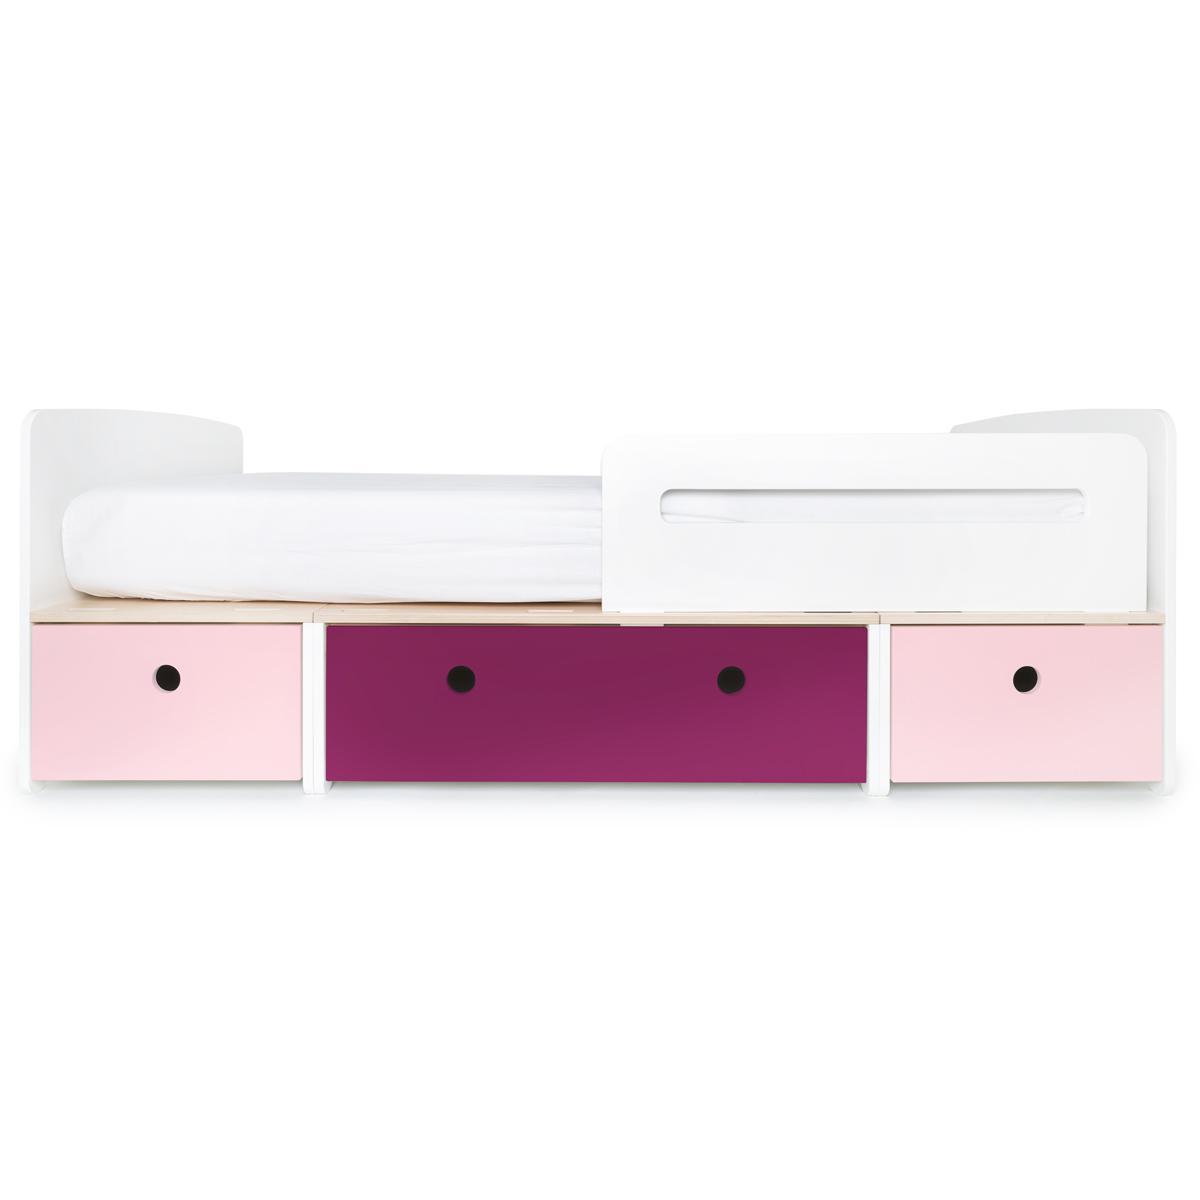 Cama evolutiva 90x200cm COLORFLEX Abitare Kids sweet pink-plum-sweet pink